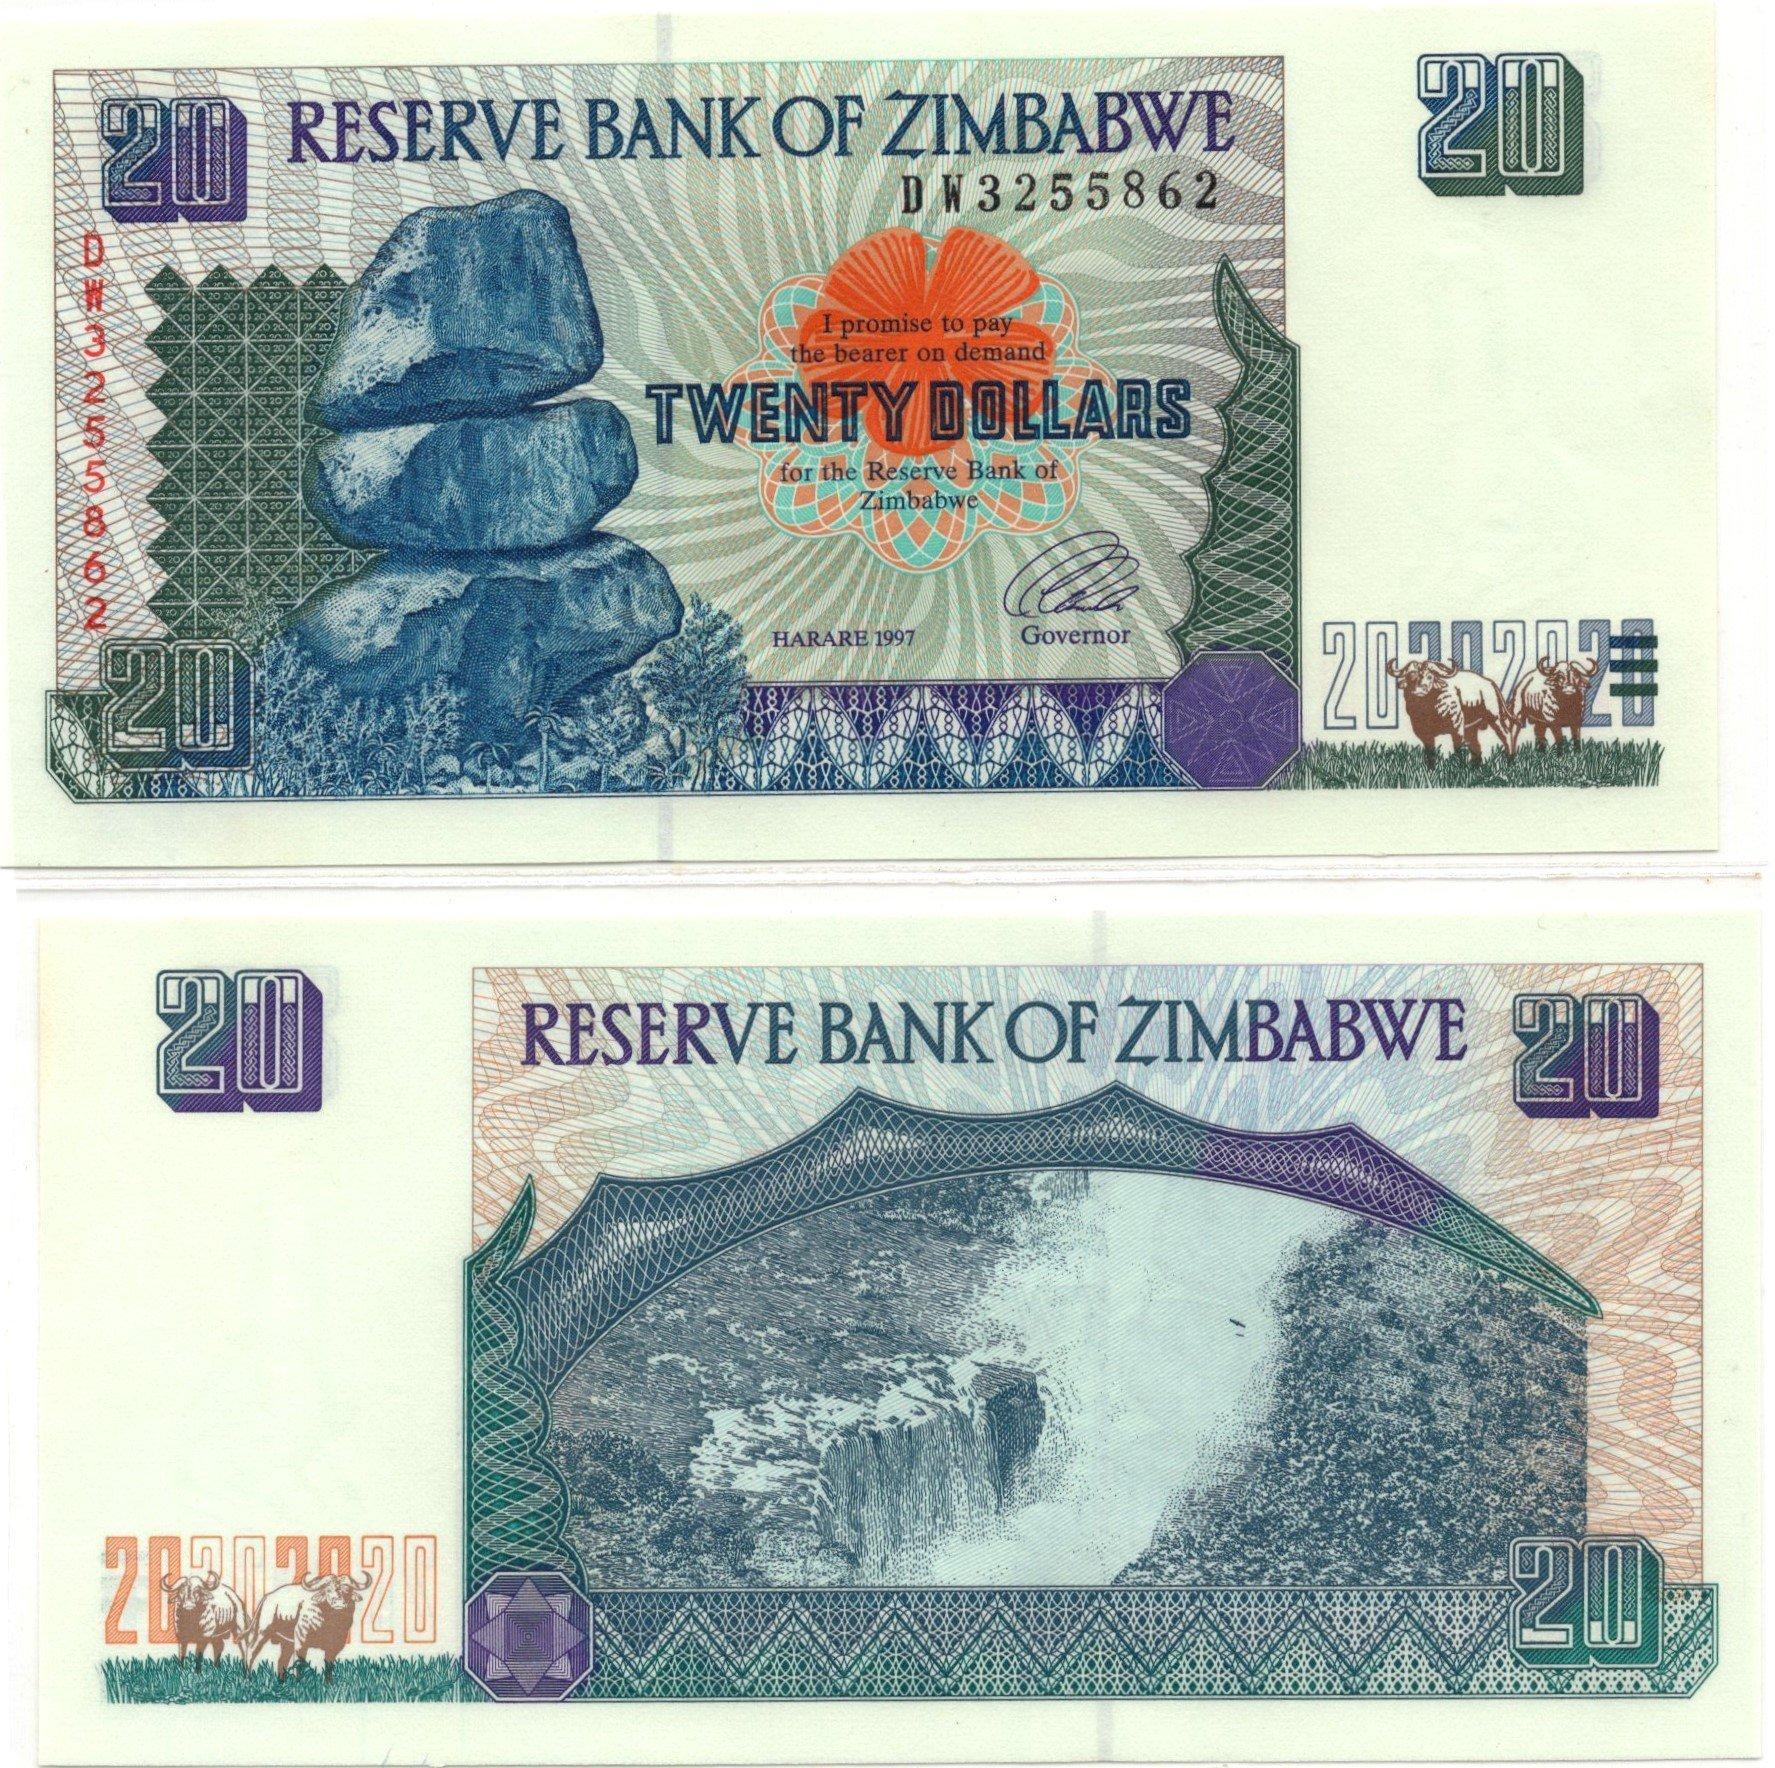 Zimbabwe 20 dollars 1997 banknote7